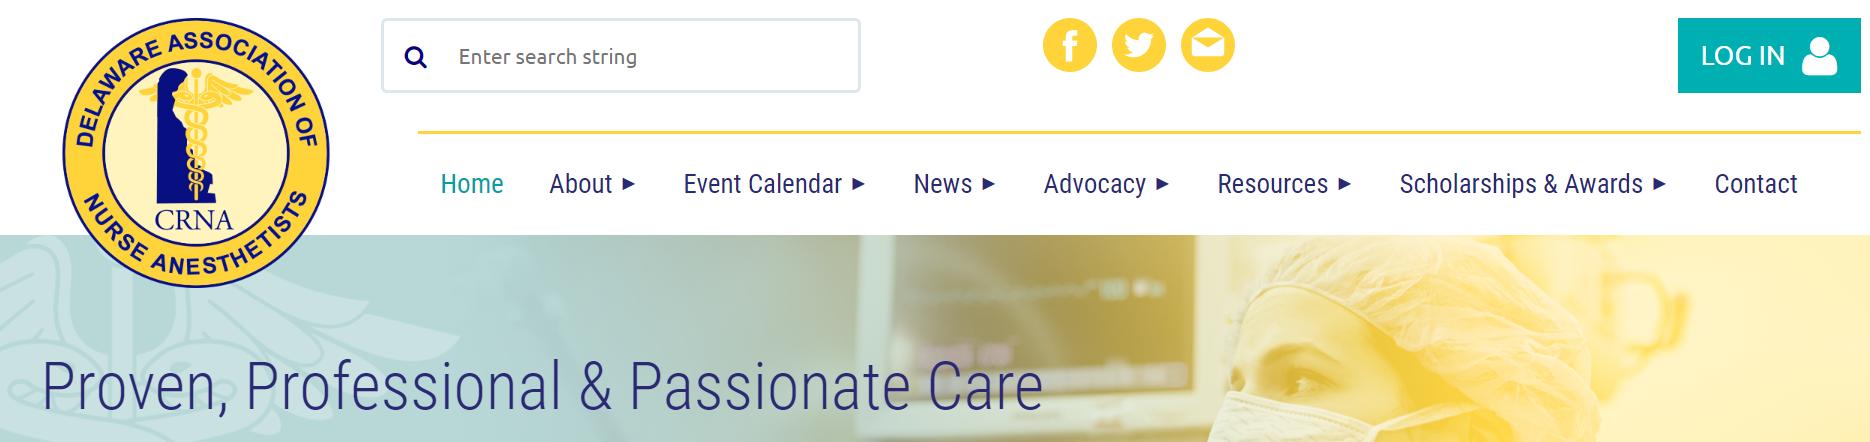 Delaware Association of Nurse Anesthetists image